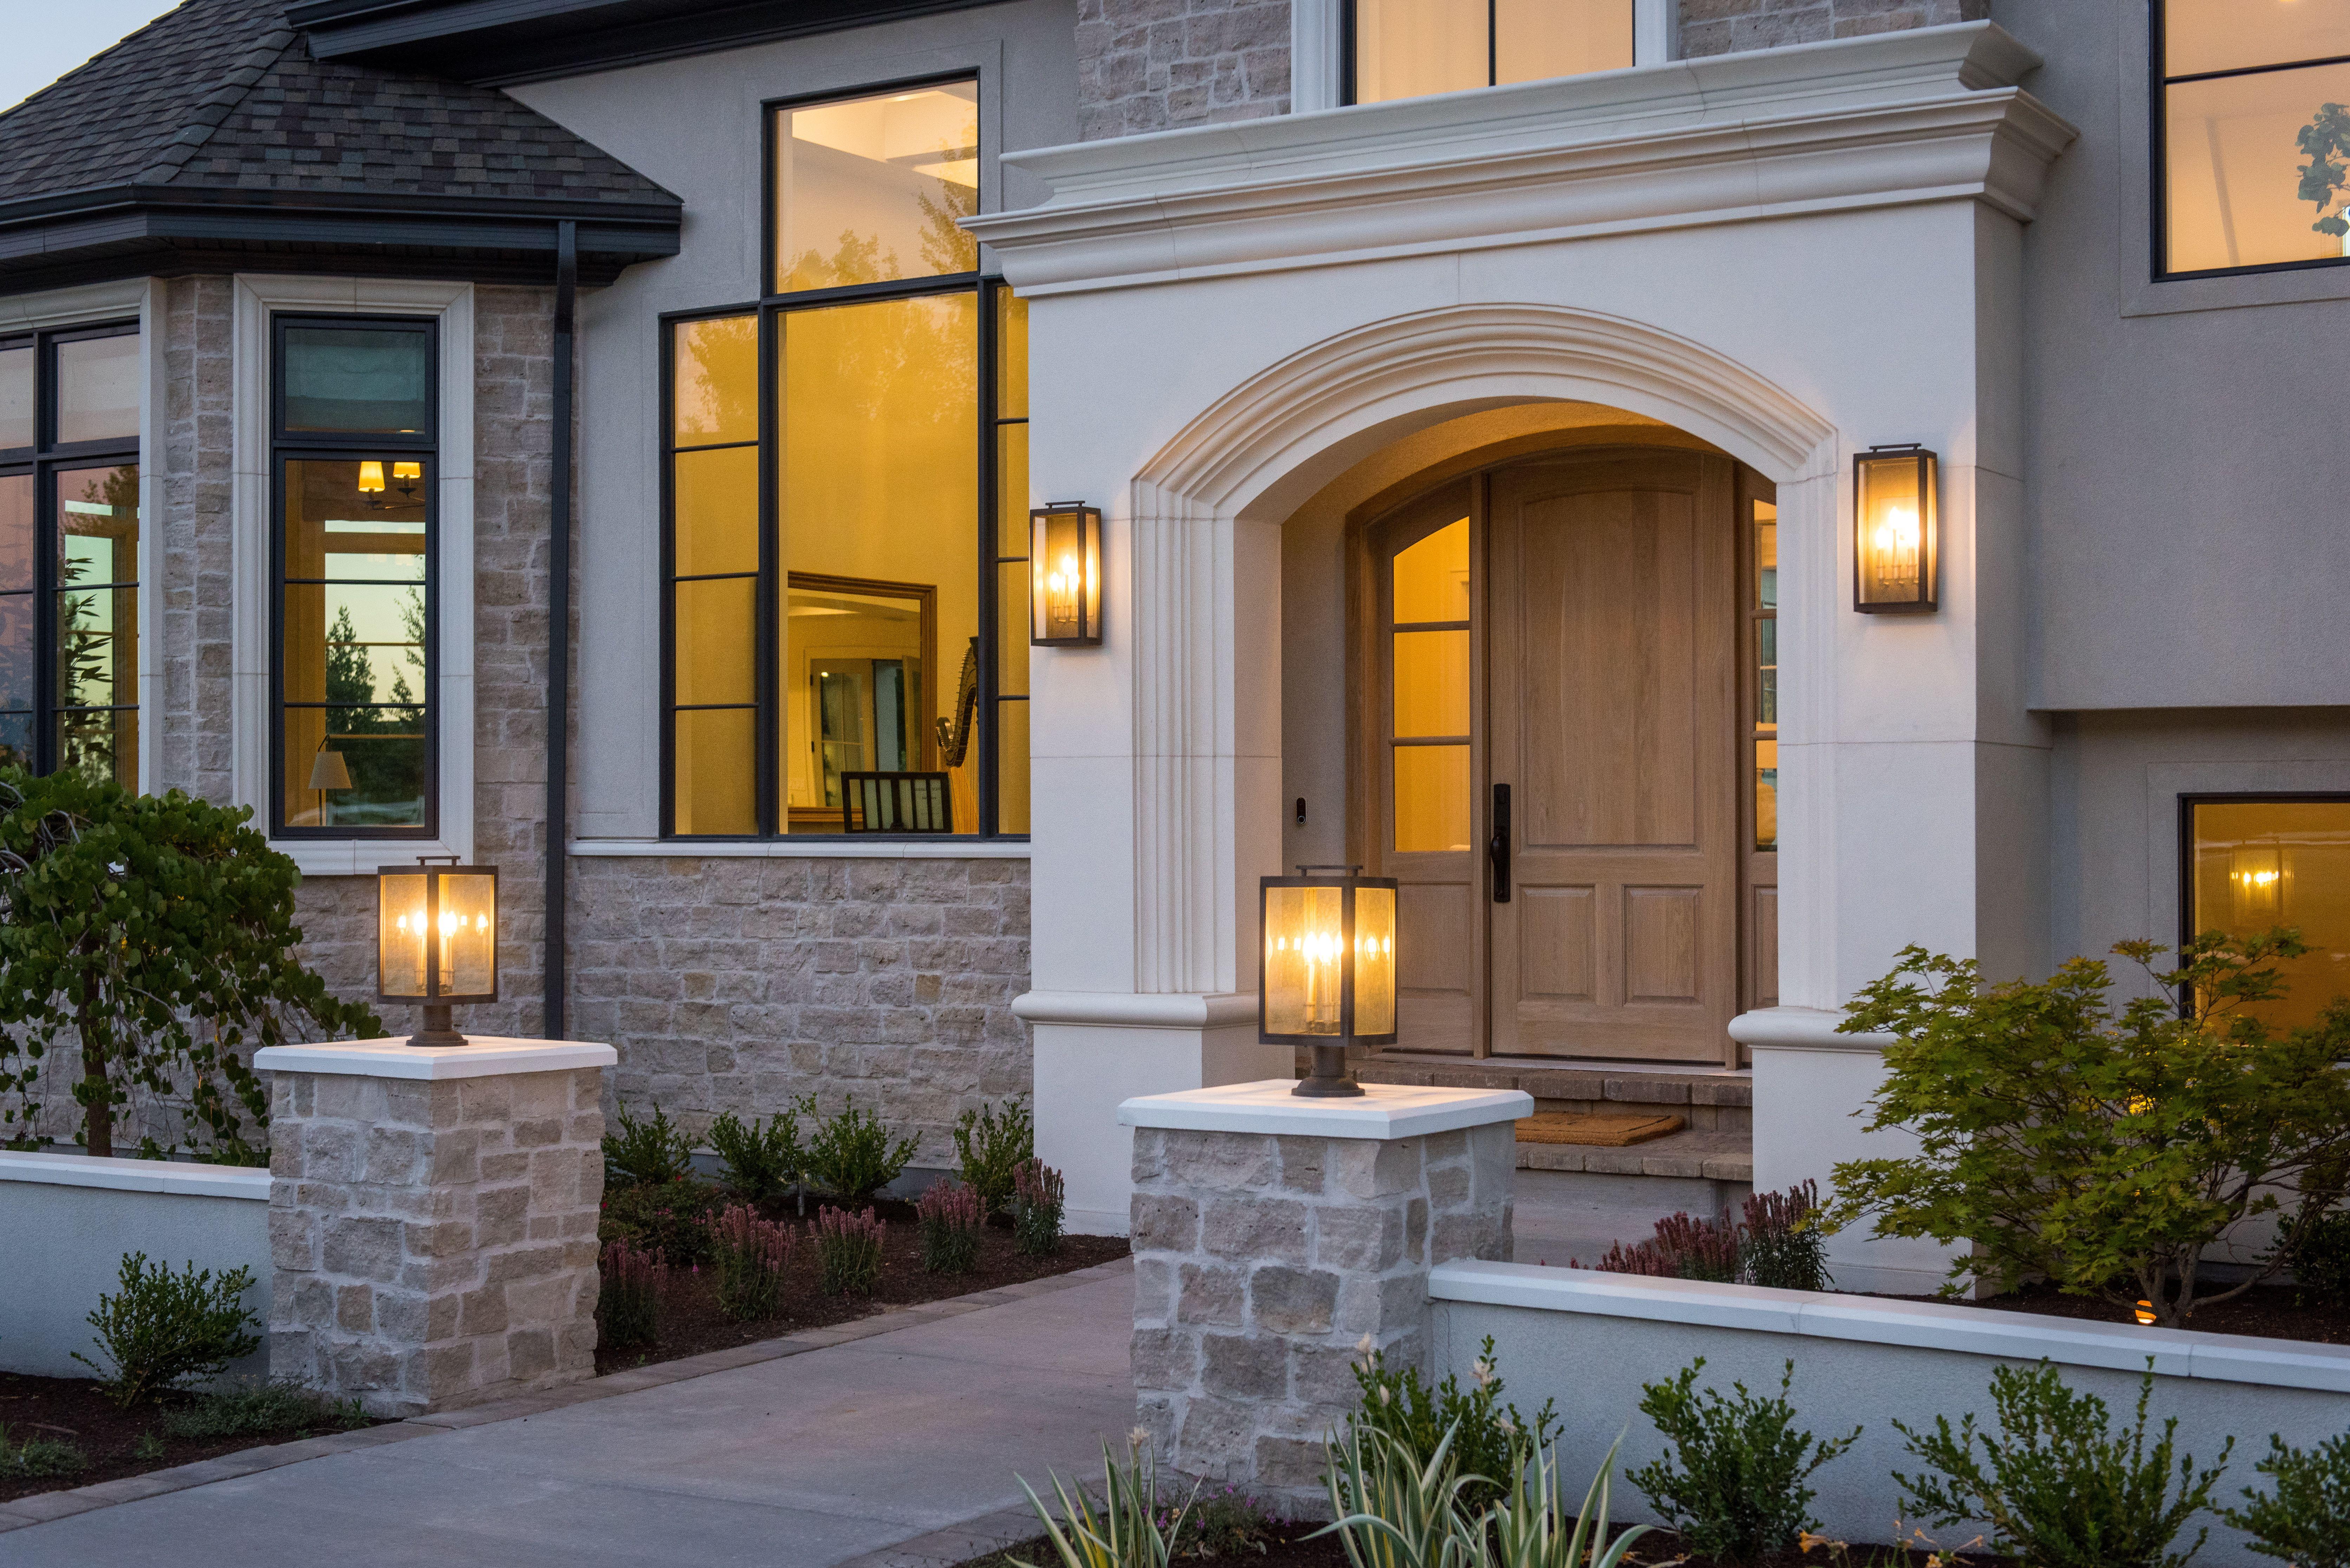 Sunrise Drive - WHITE + GOLD DESIGN | House exterior ...